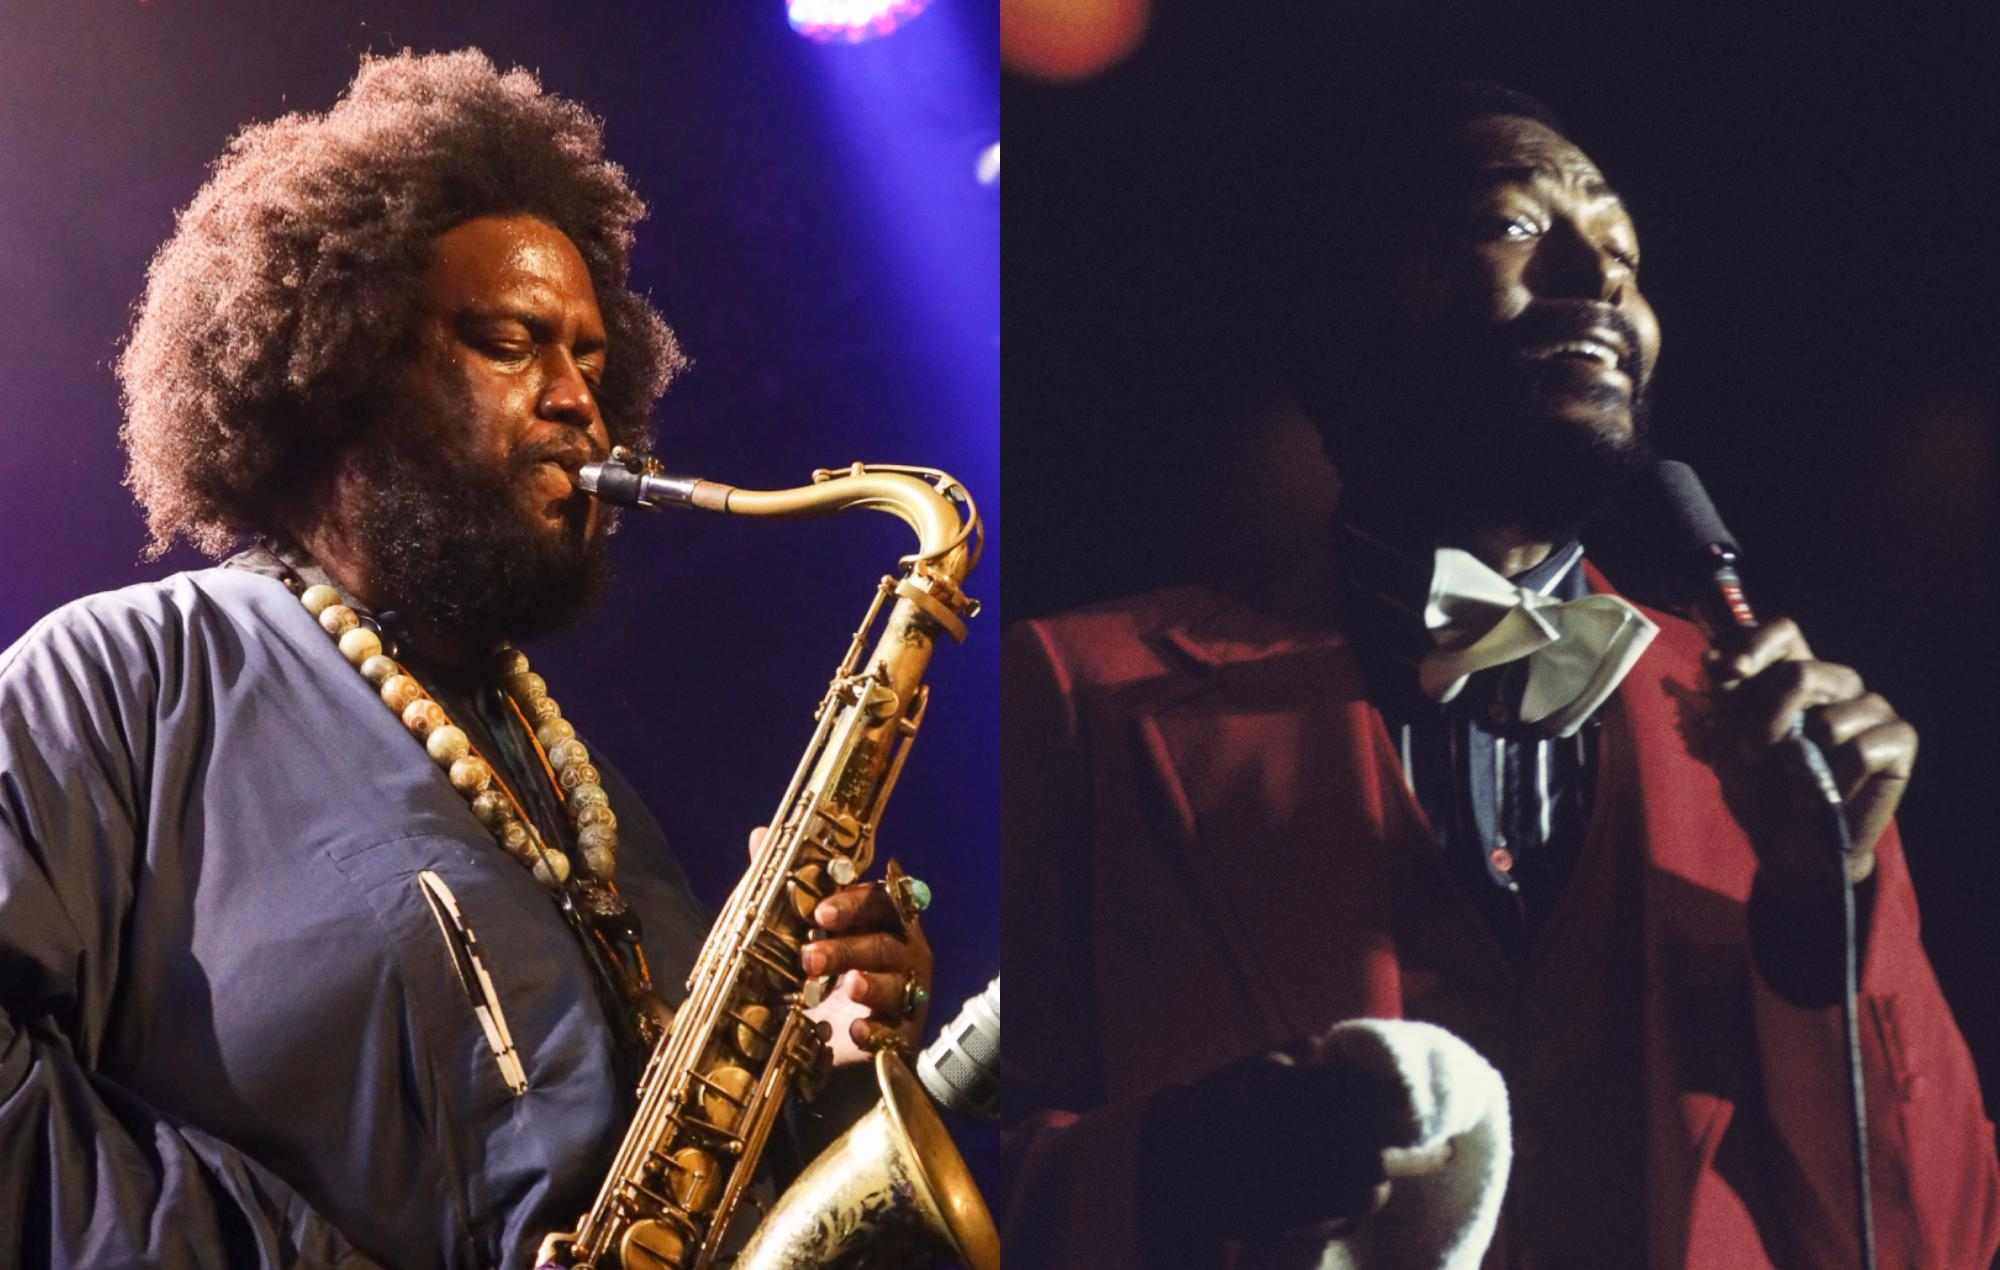 Watch Kamasi Washington and more cover Marvin Gaye at the Grammys